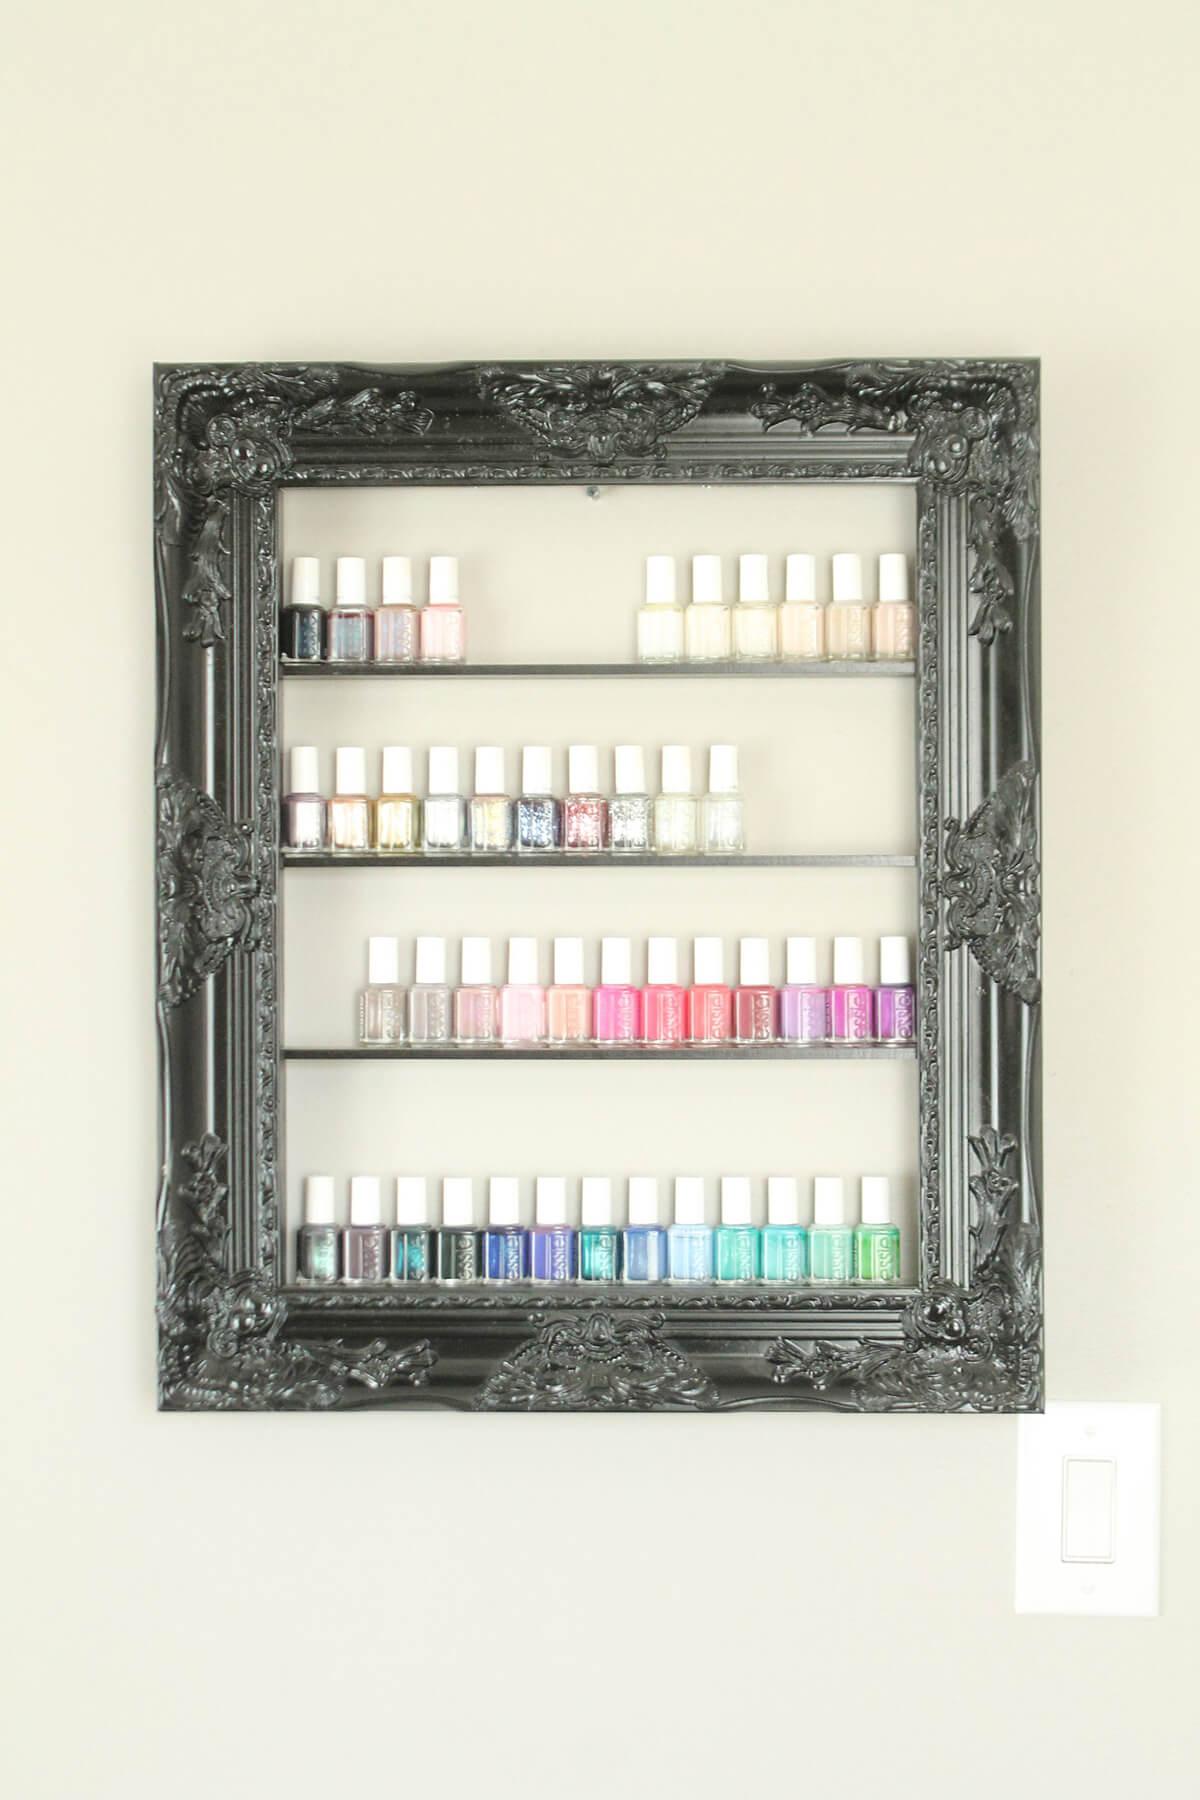 Colorful Nail Polish in an Elegant Frame